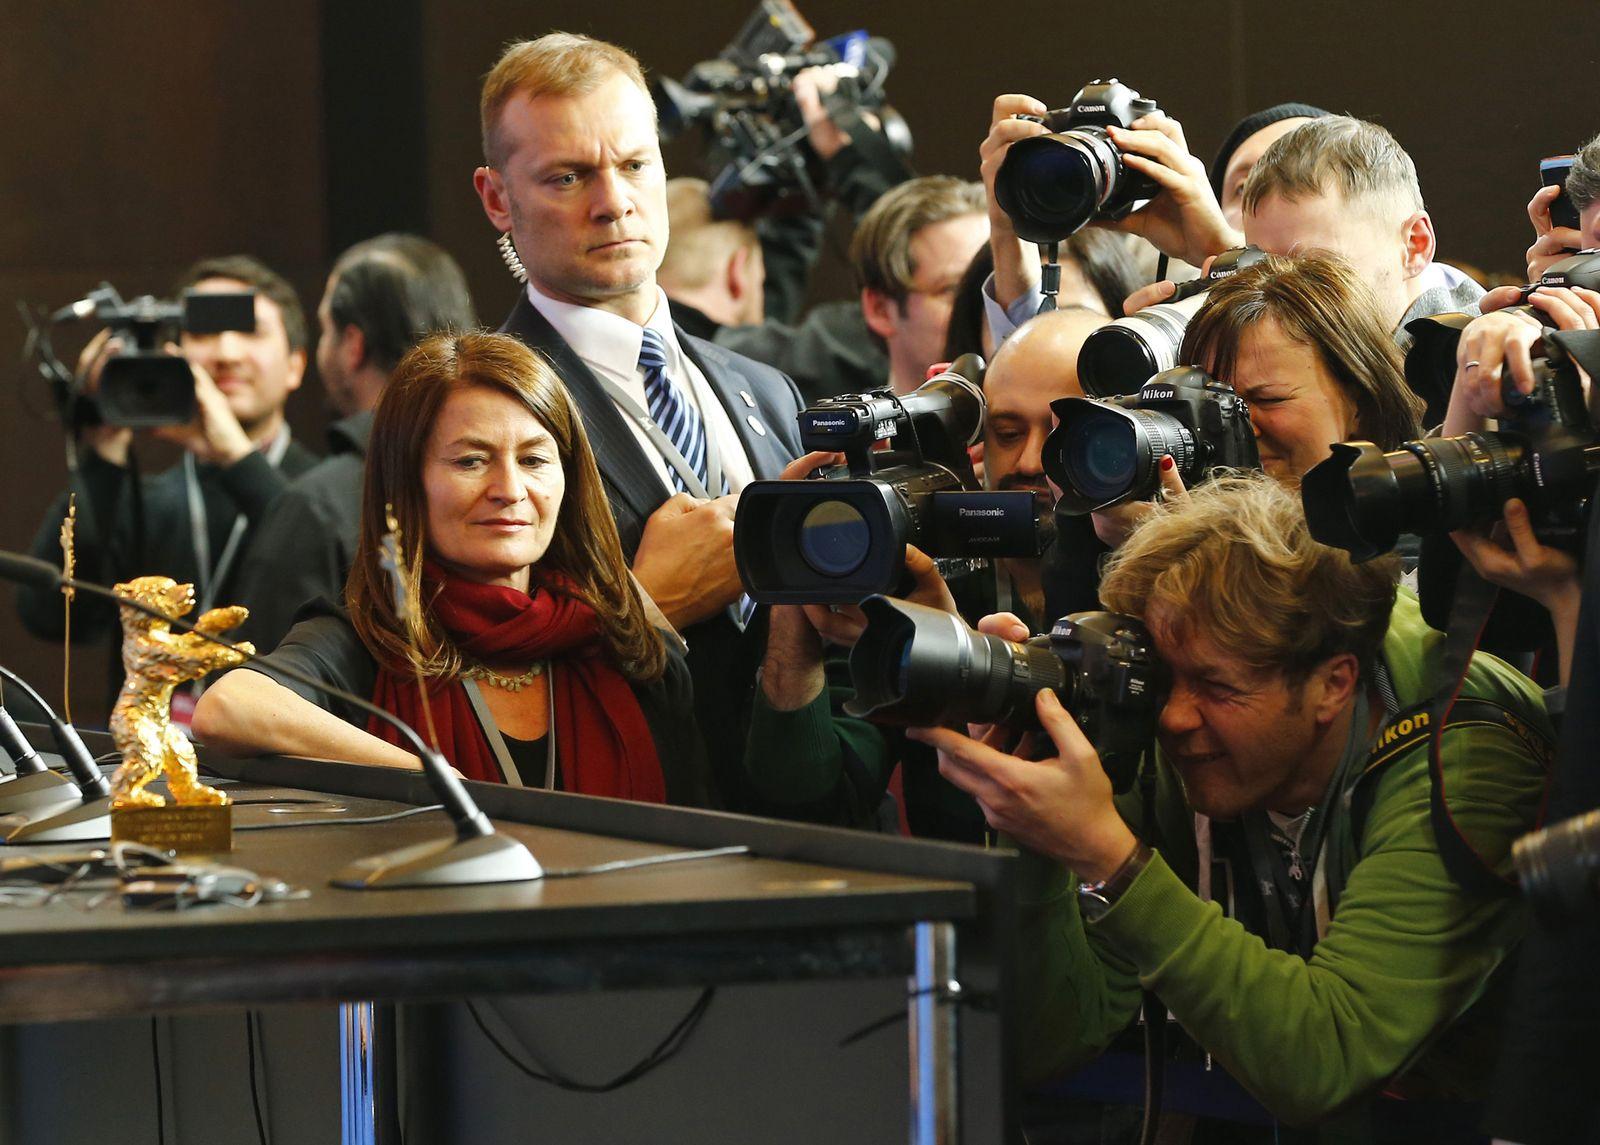 Germany Berlin Film Festival 2015 Award Ceremony Press Conference